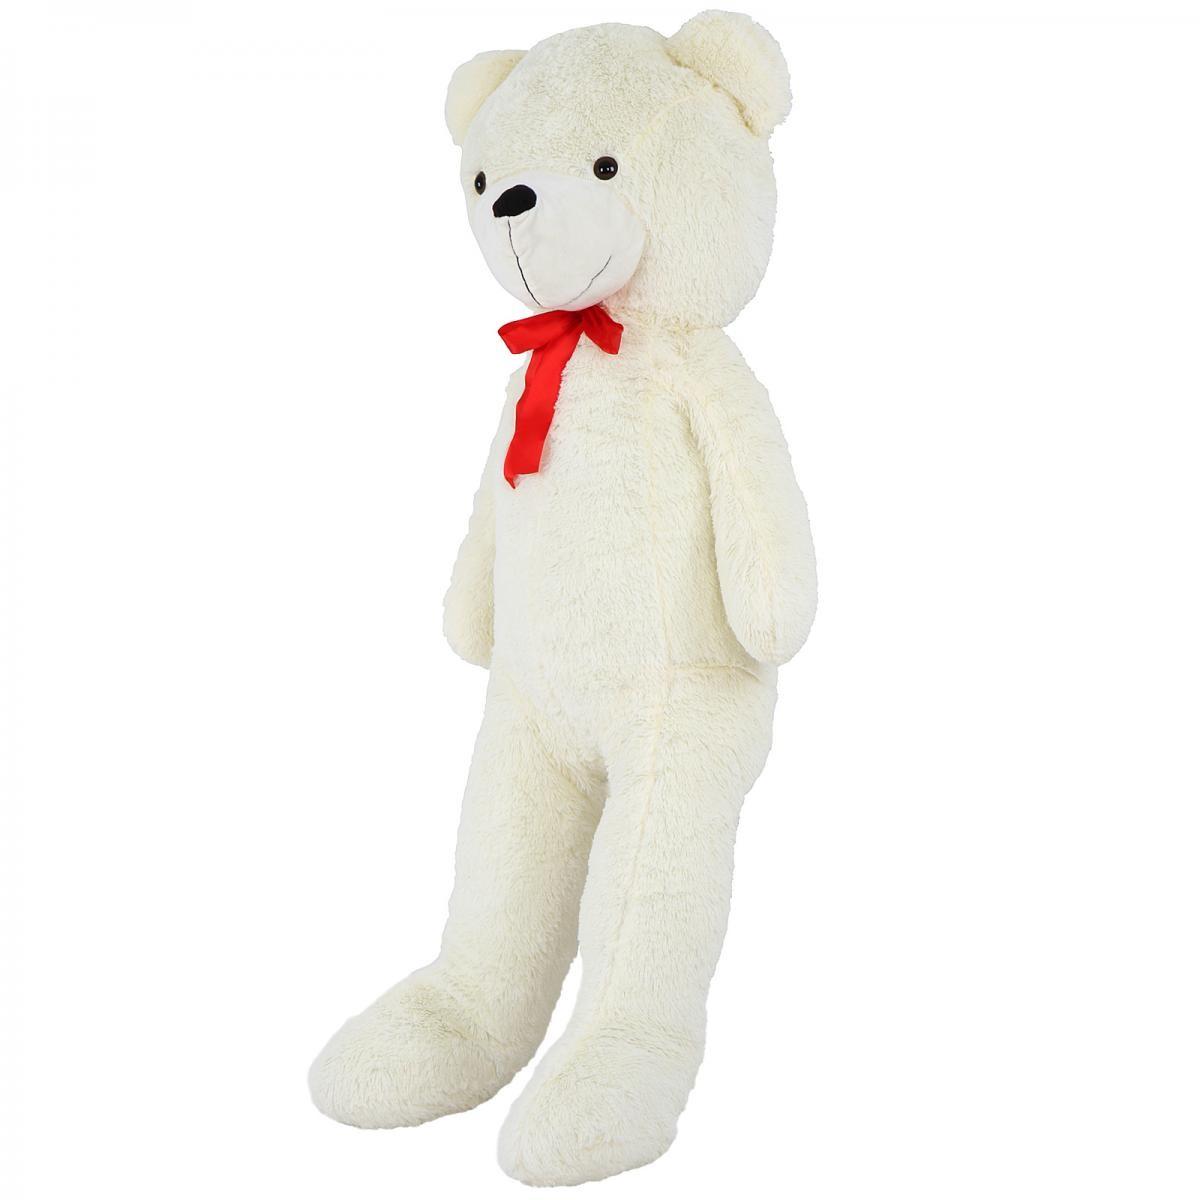 Beste Teddybär Färbung Bilder - Malvorlagen-Ideen - decentexposure.info